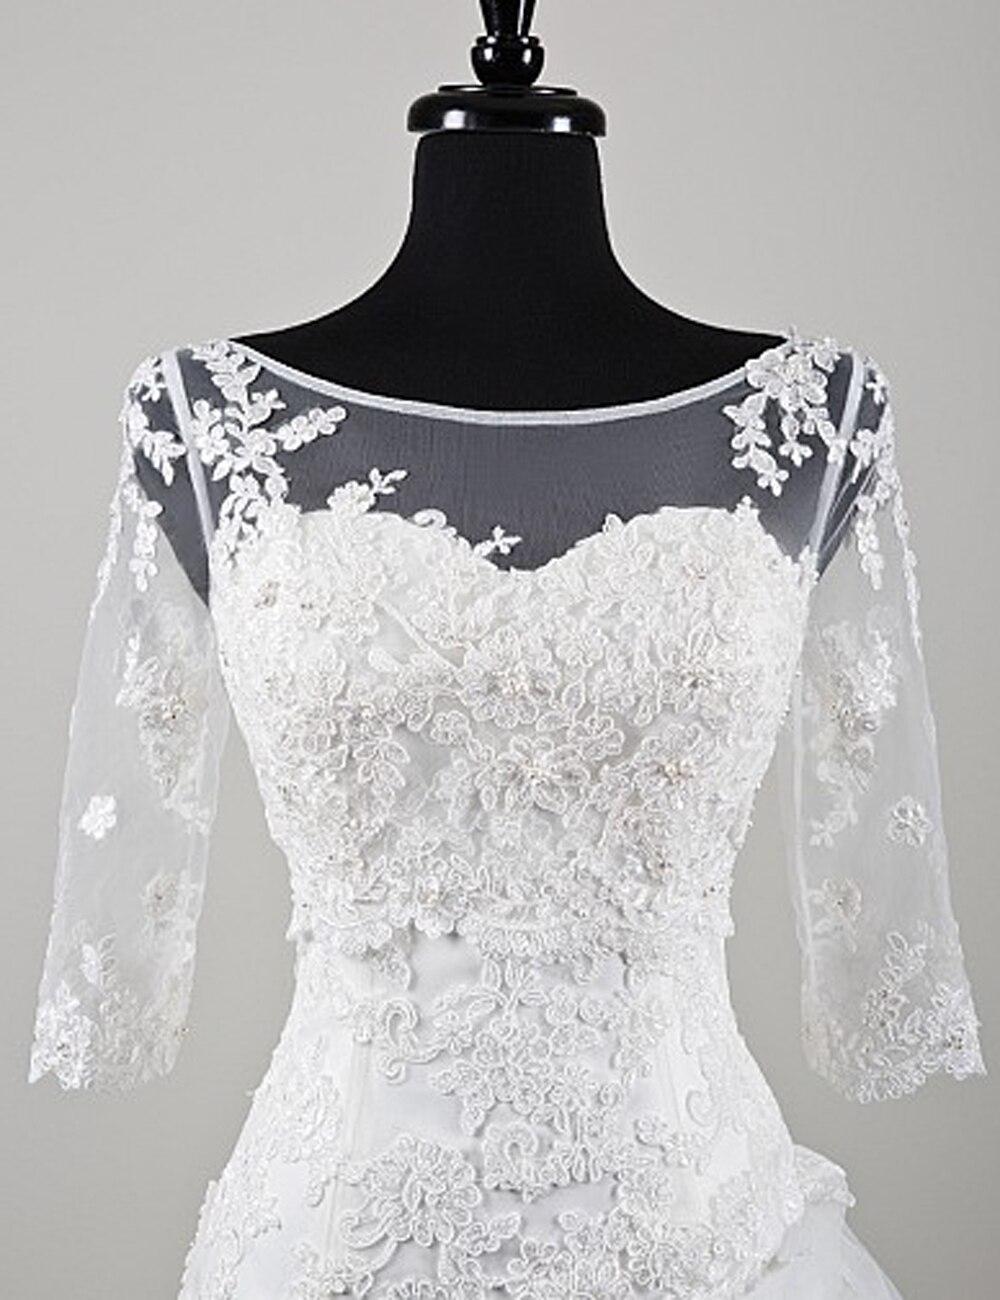 Scoop Neck Wedding Jacket Bride Bolero Top Lace Applique White Ivory Wraps Shrug